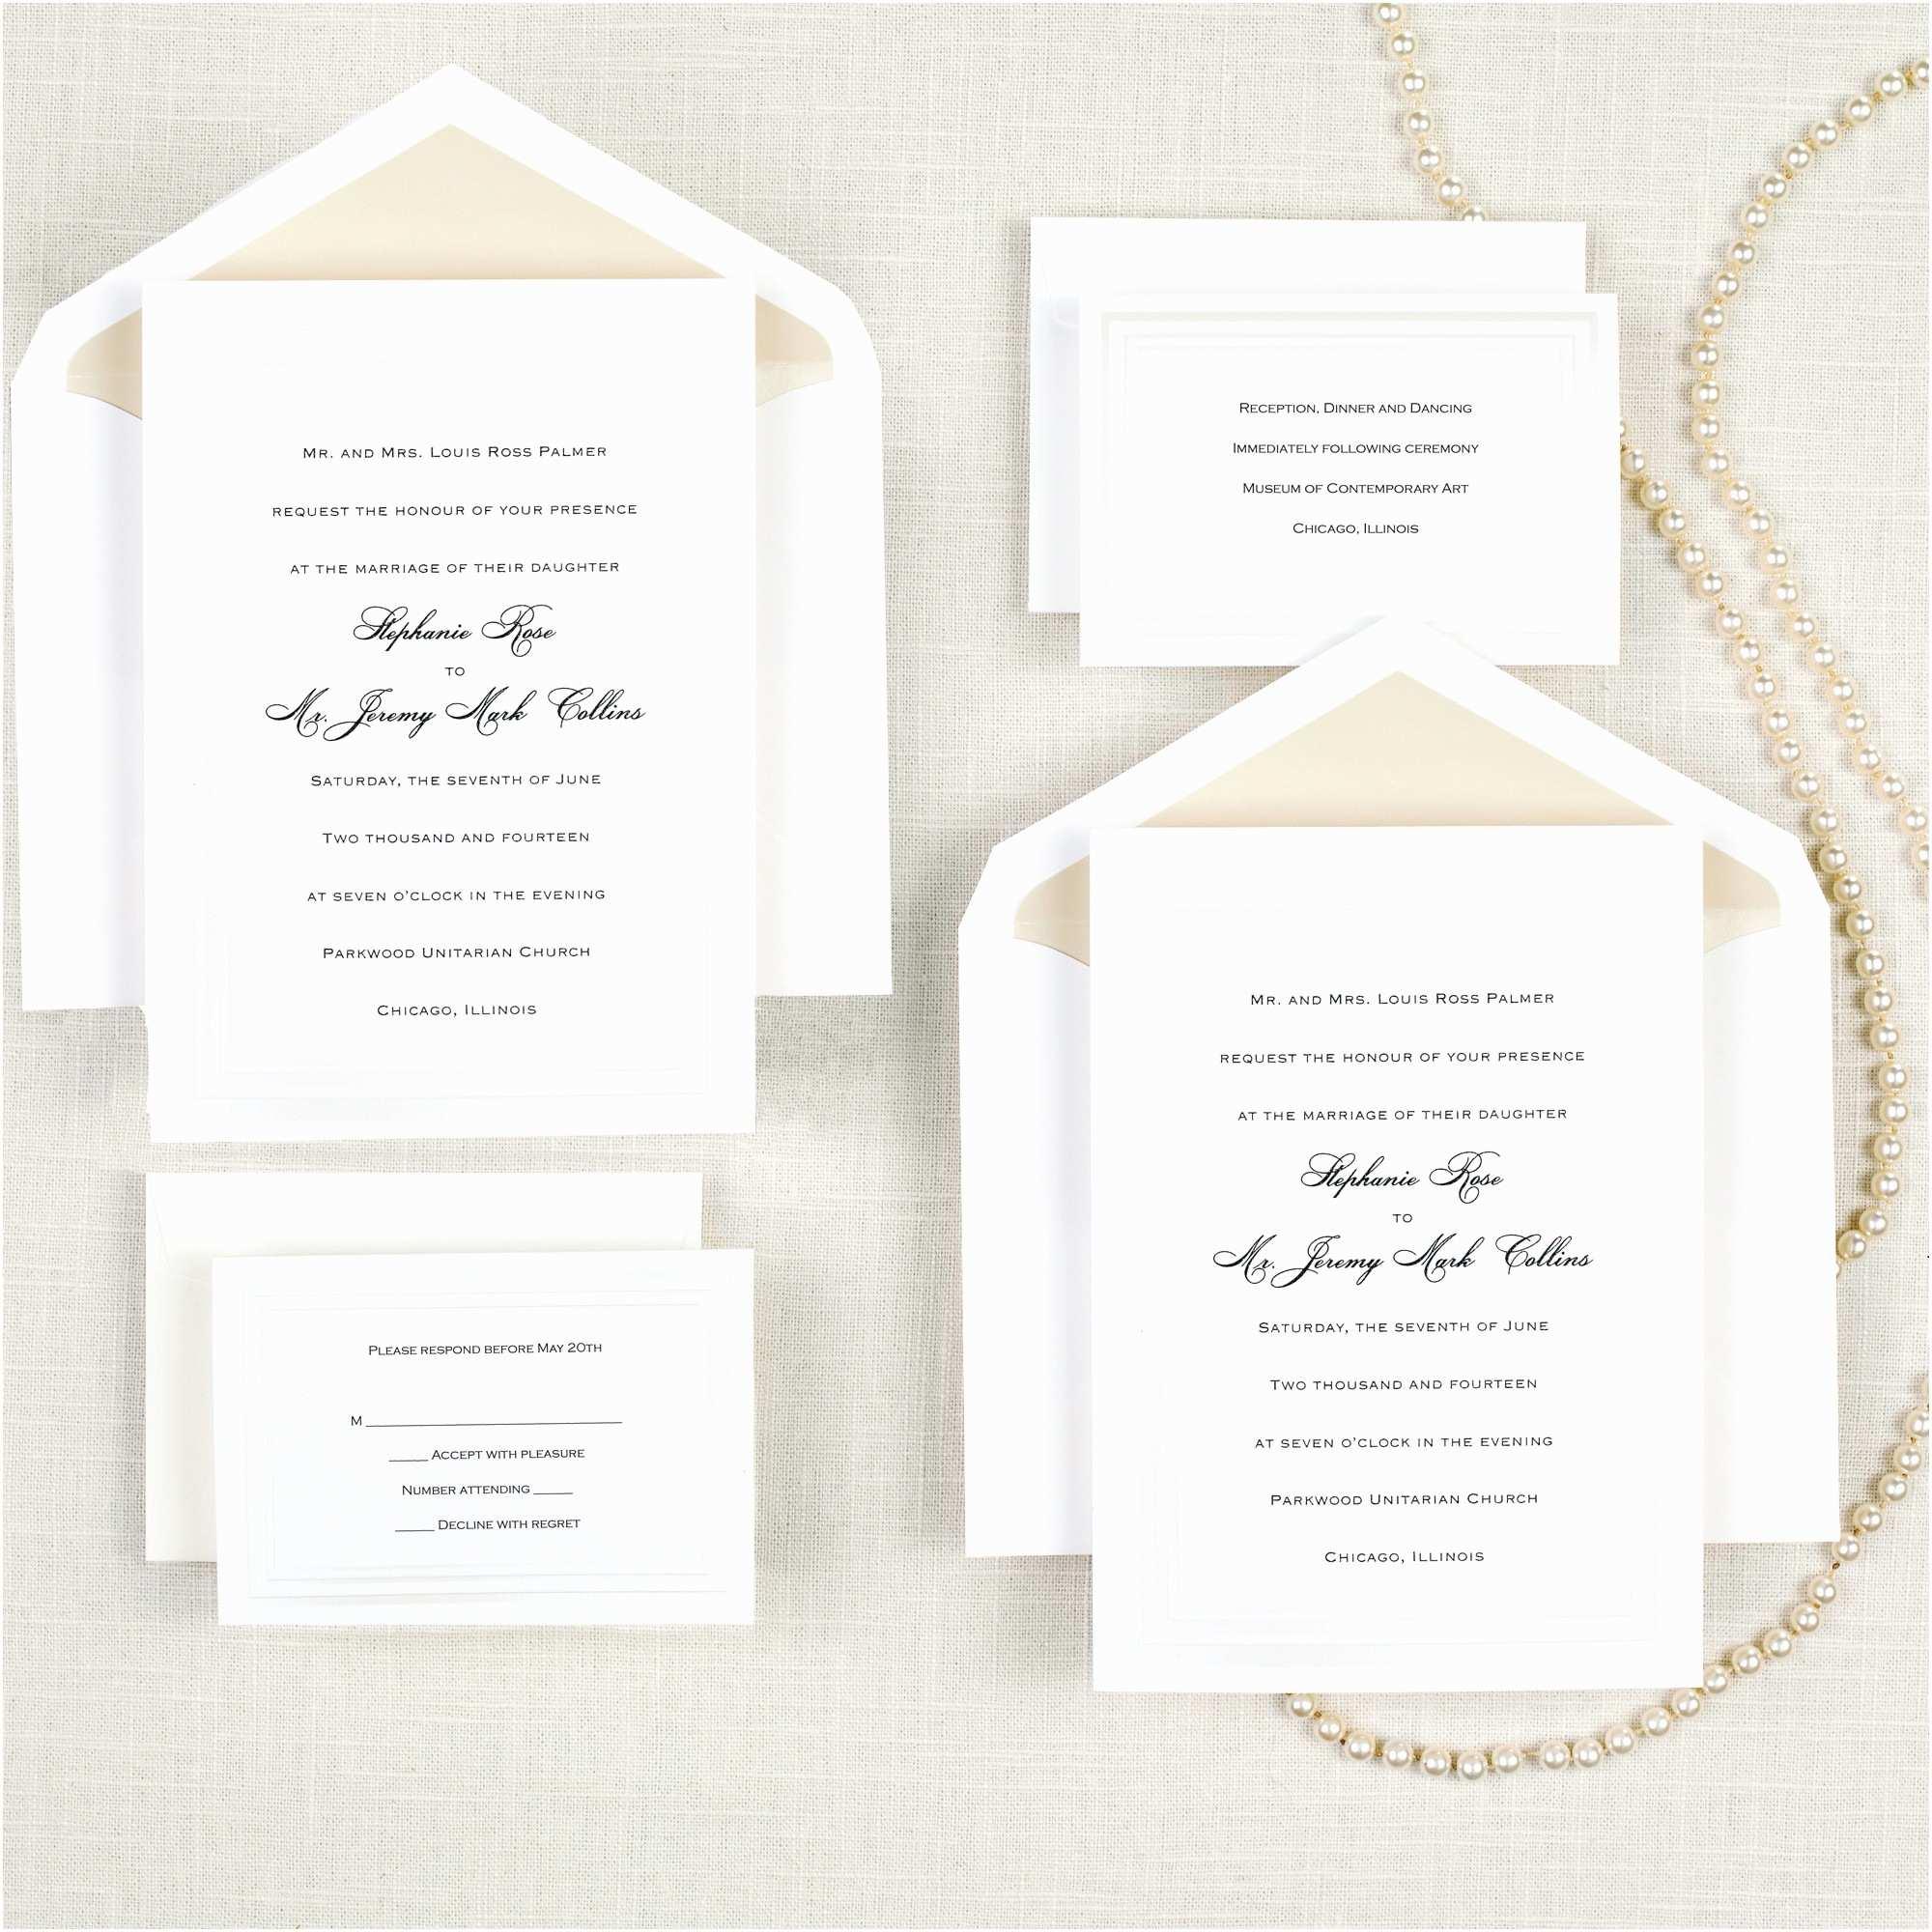 Full Wedding Invitation Sets Designs Cheap Wedding Invitation Sets Line as Well with